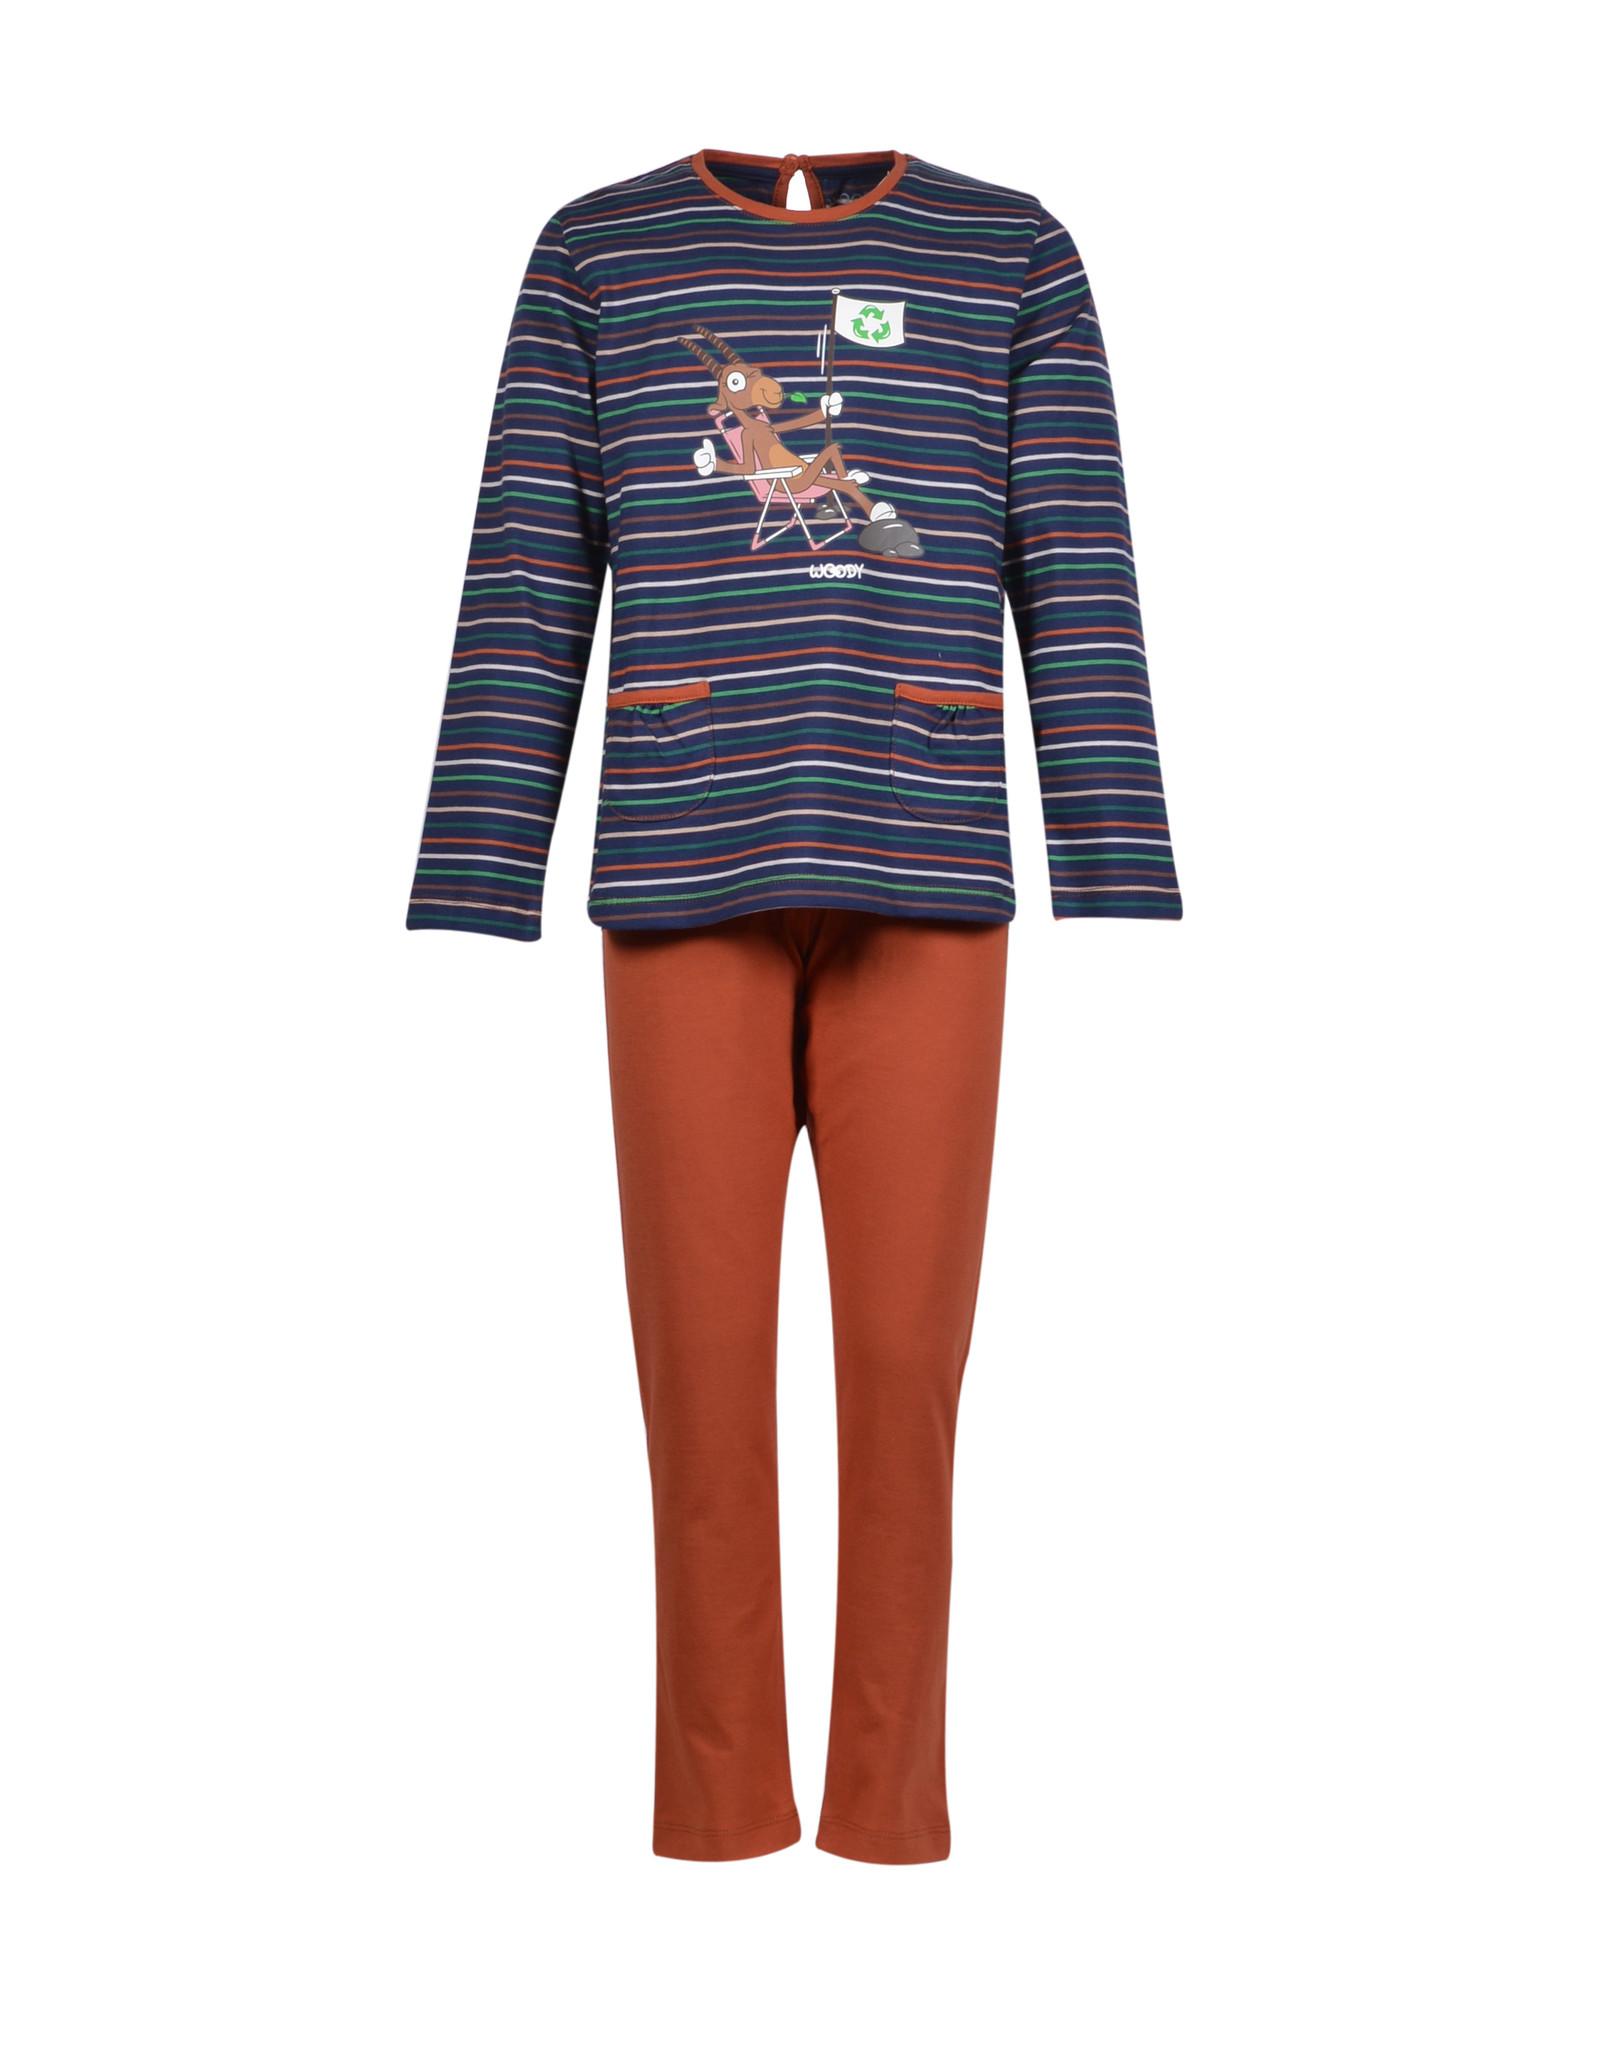 Woody Meisjes pyjama, multicolor